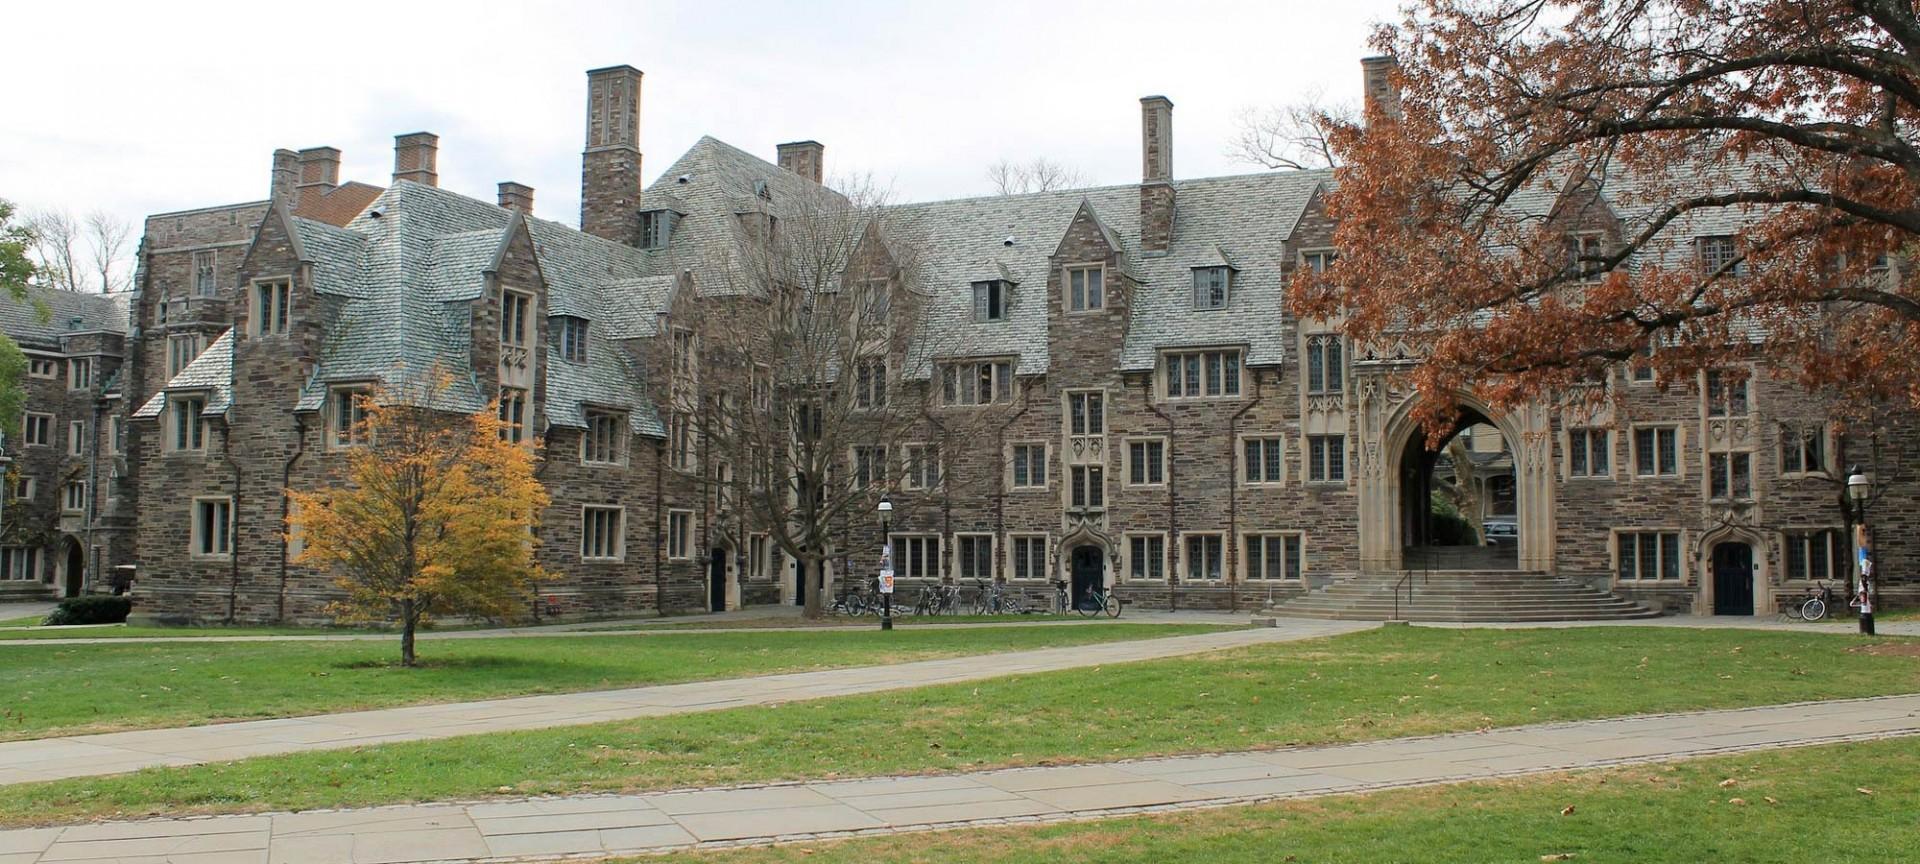 001 Princeton Essay Astounding Review College Guide Graded Confidential 1920